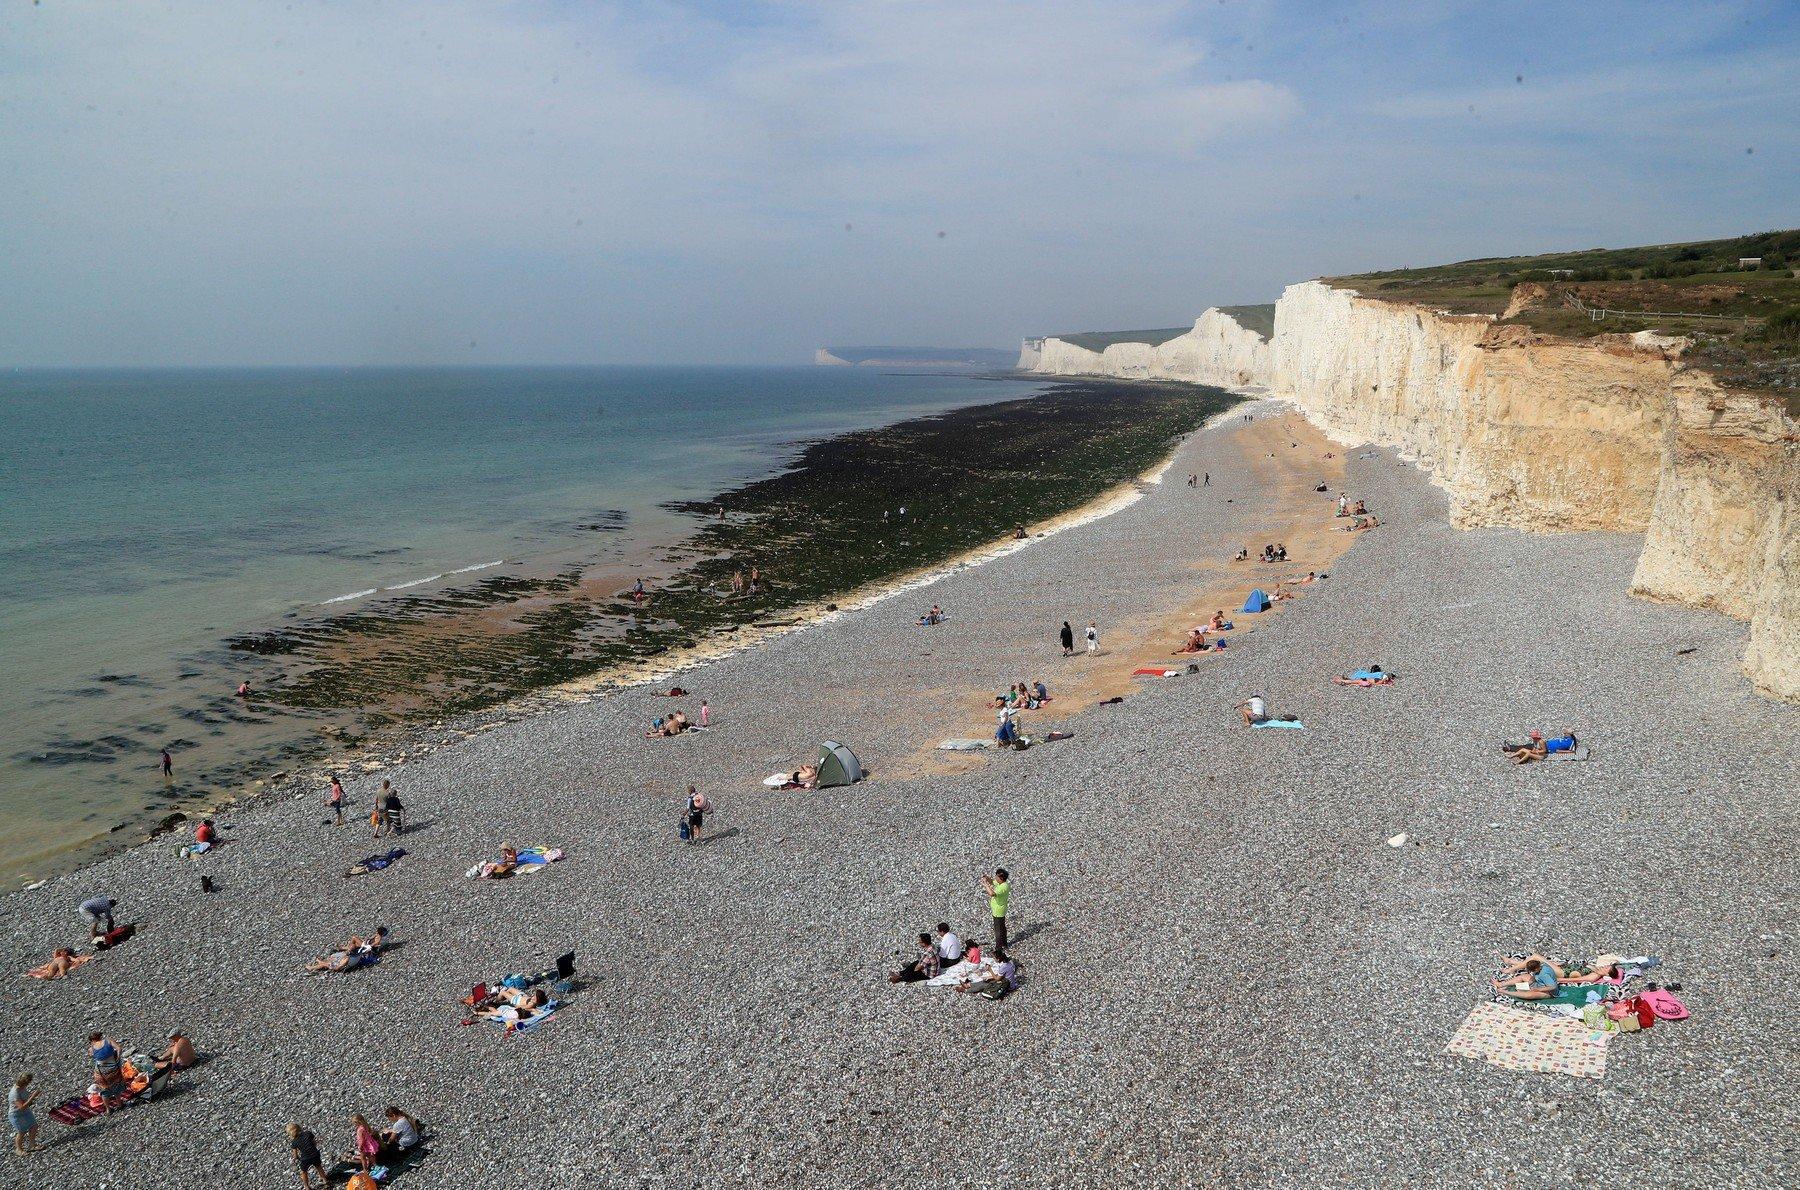 Plaža Birling Gap pokraj Eastbournea u Istočnom Sussexu